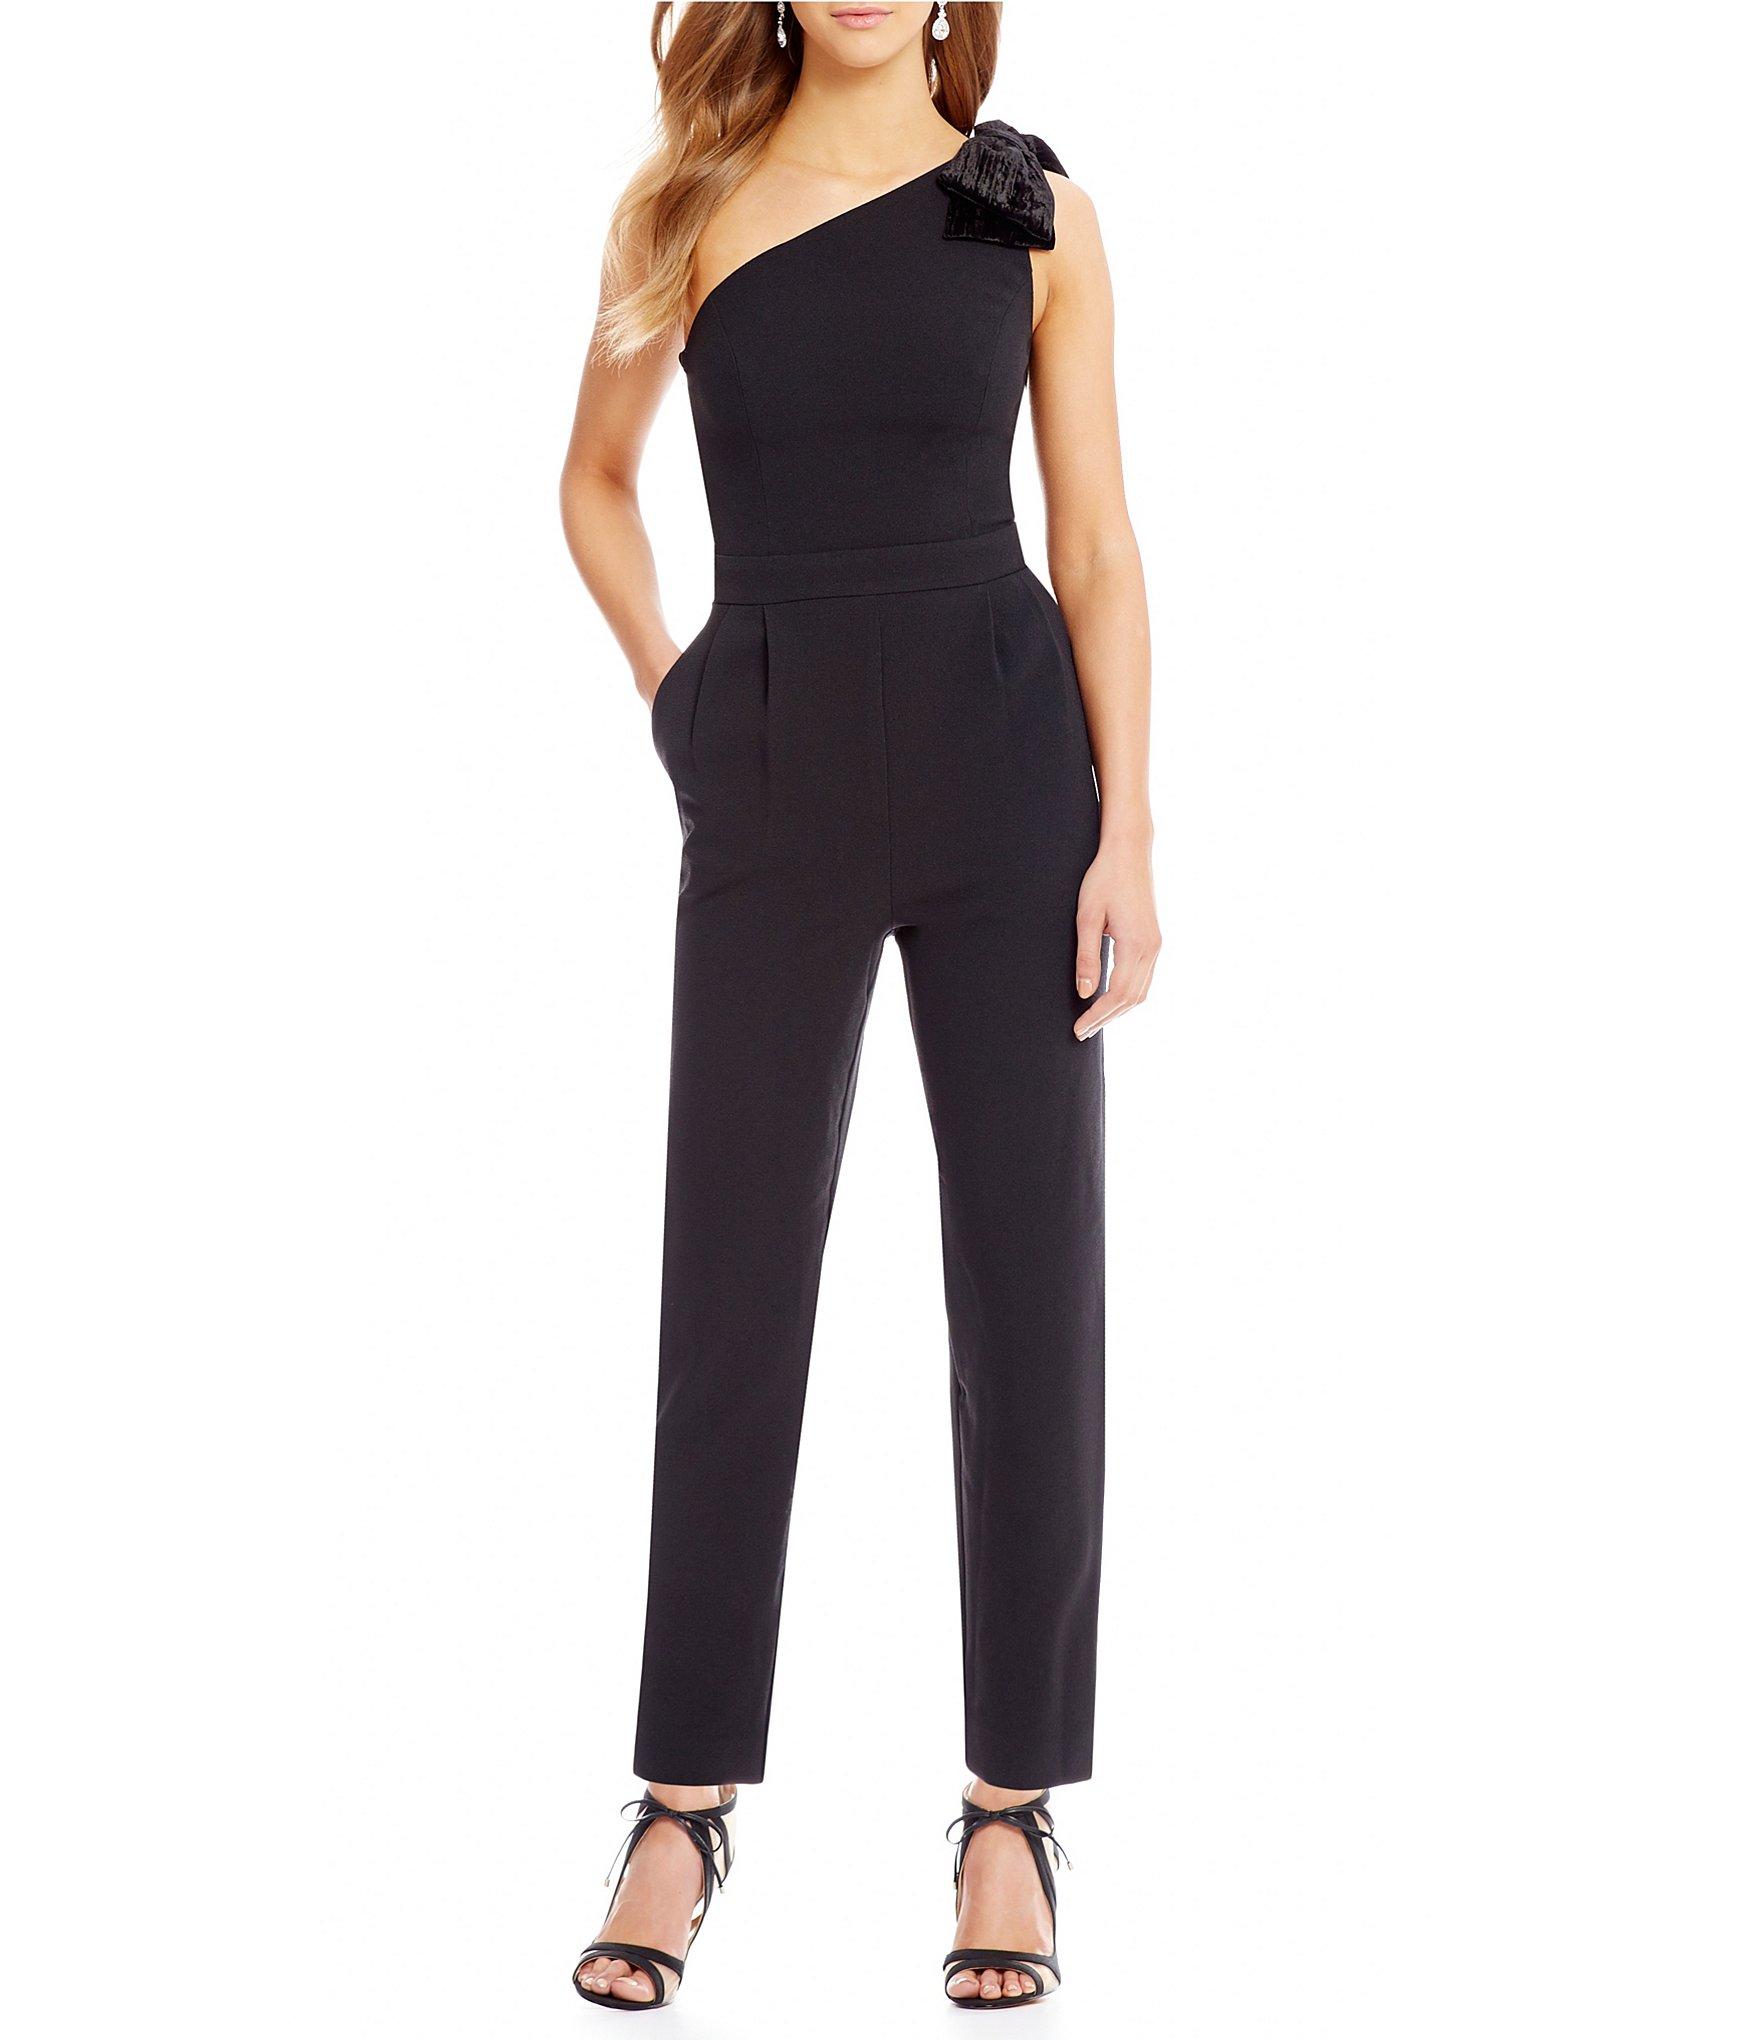 Long Sleeve Rompers | Dressy Jumpsuit | Lulus Jumpsuit